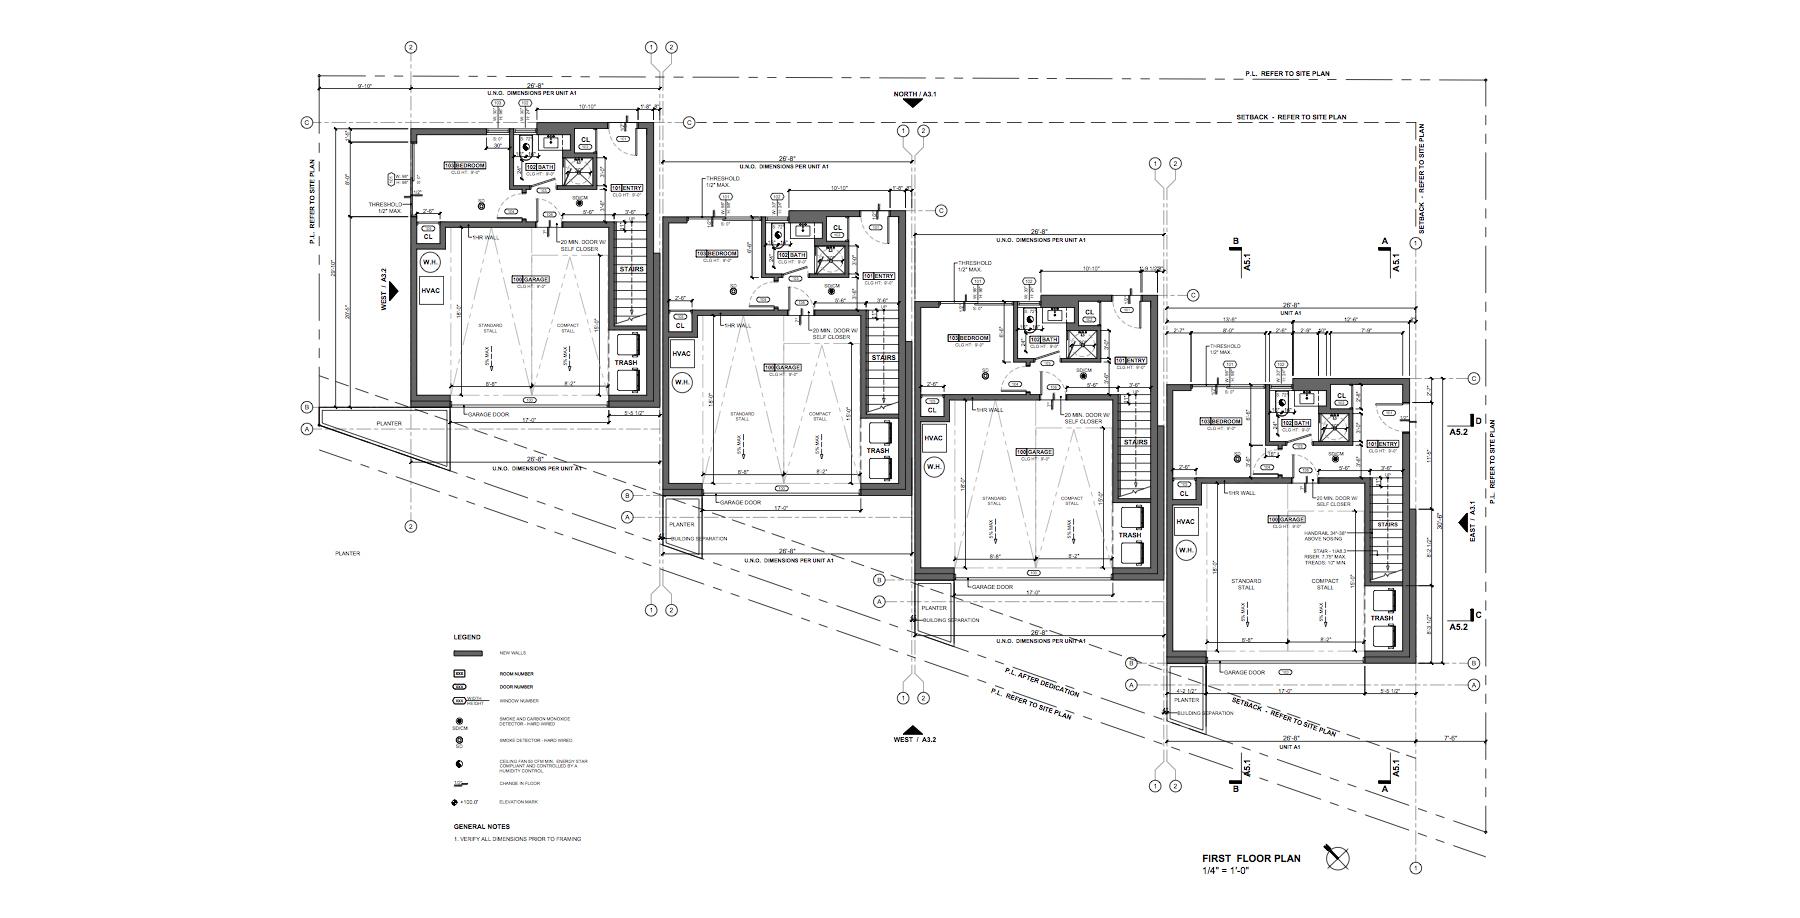 SB_170210_First floor.jpg